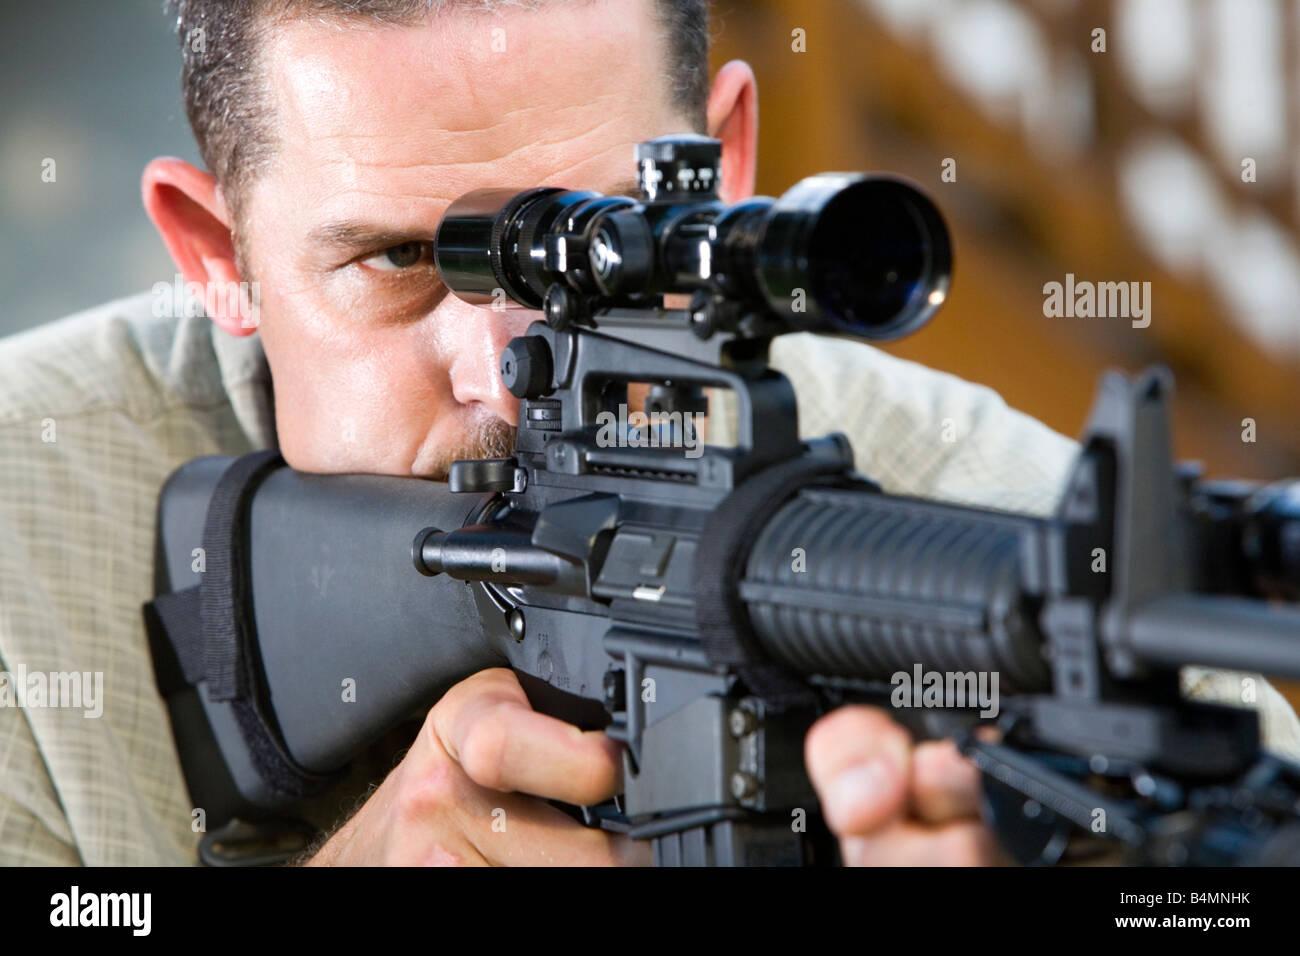 A man aims an AR 15 Bushmaster rifle Stock Photo: 20124991